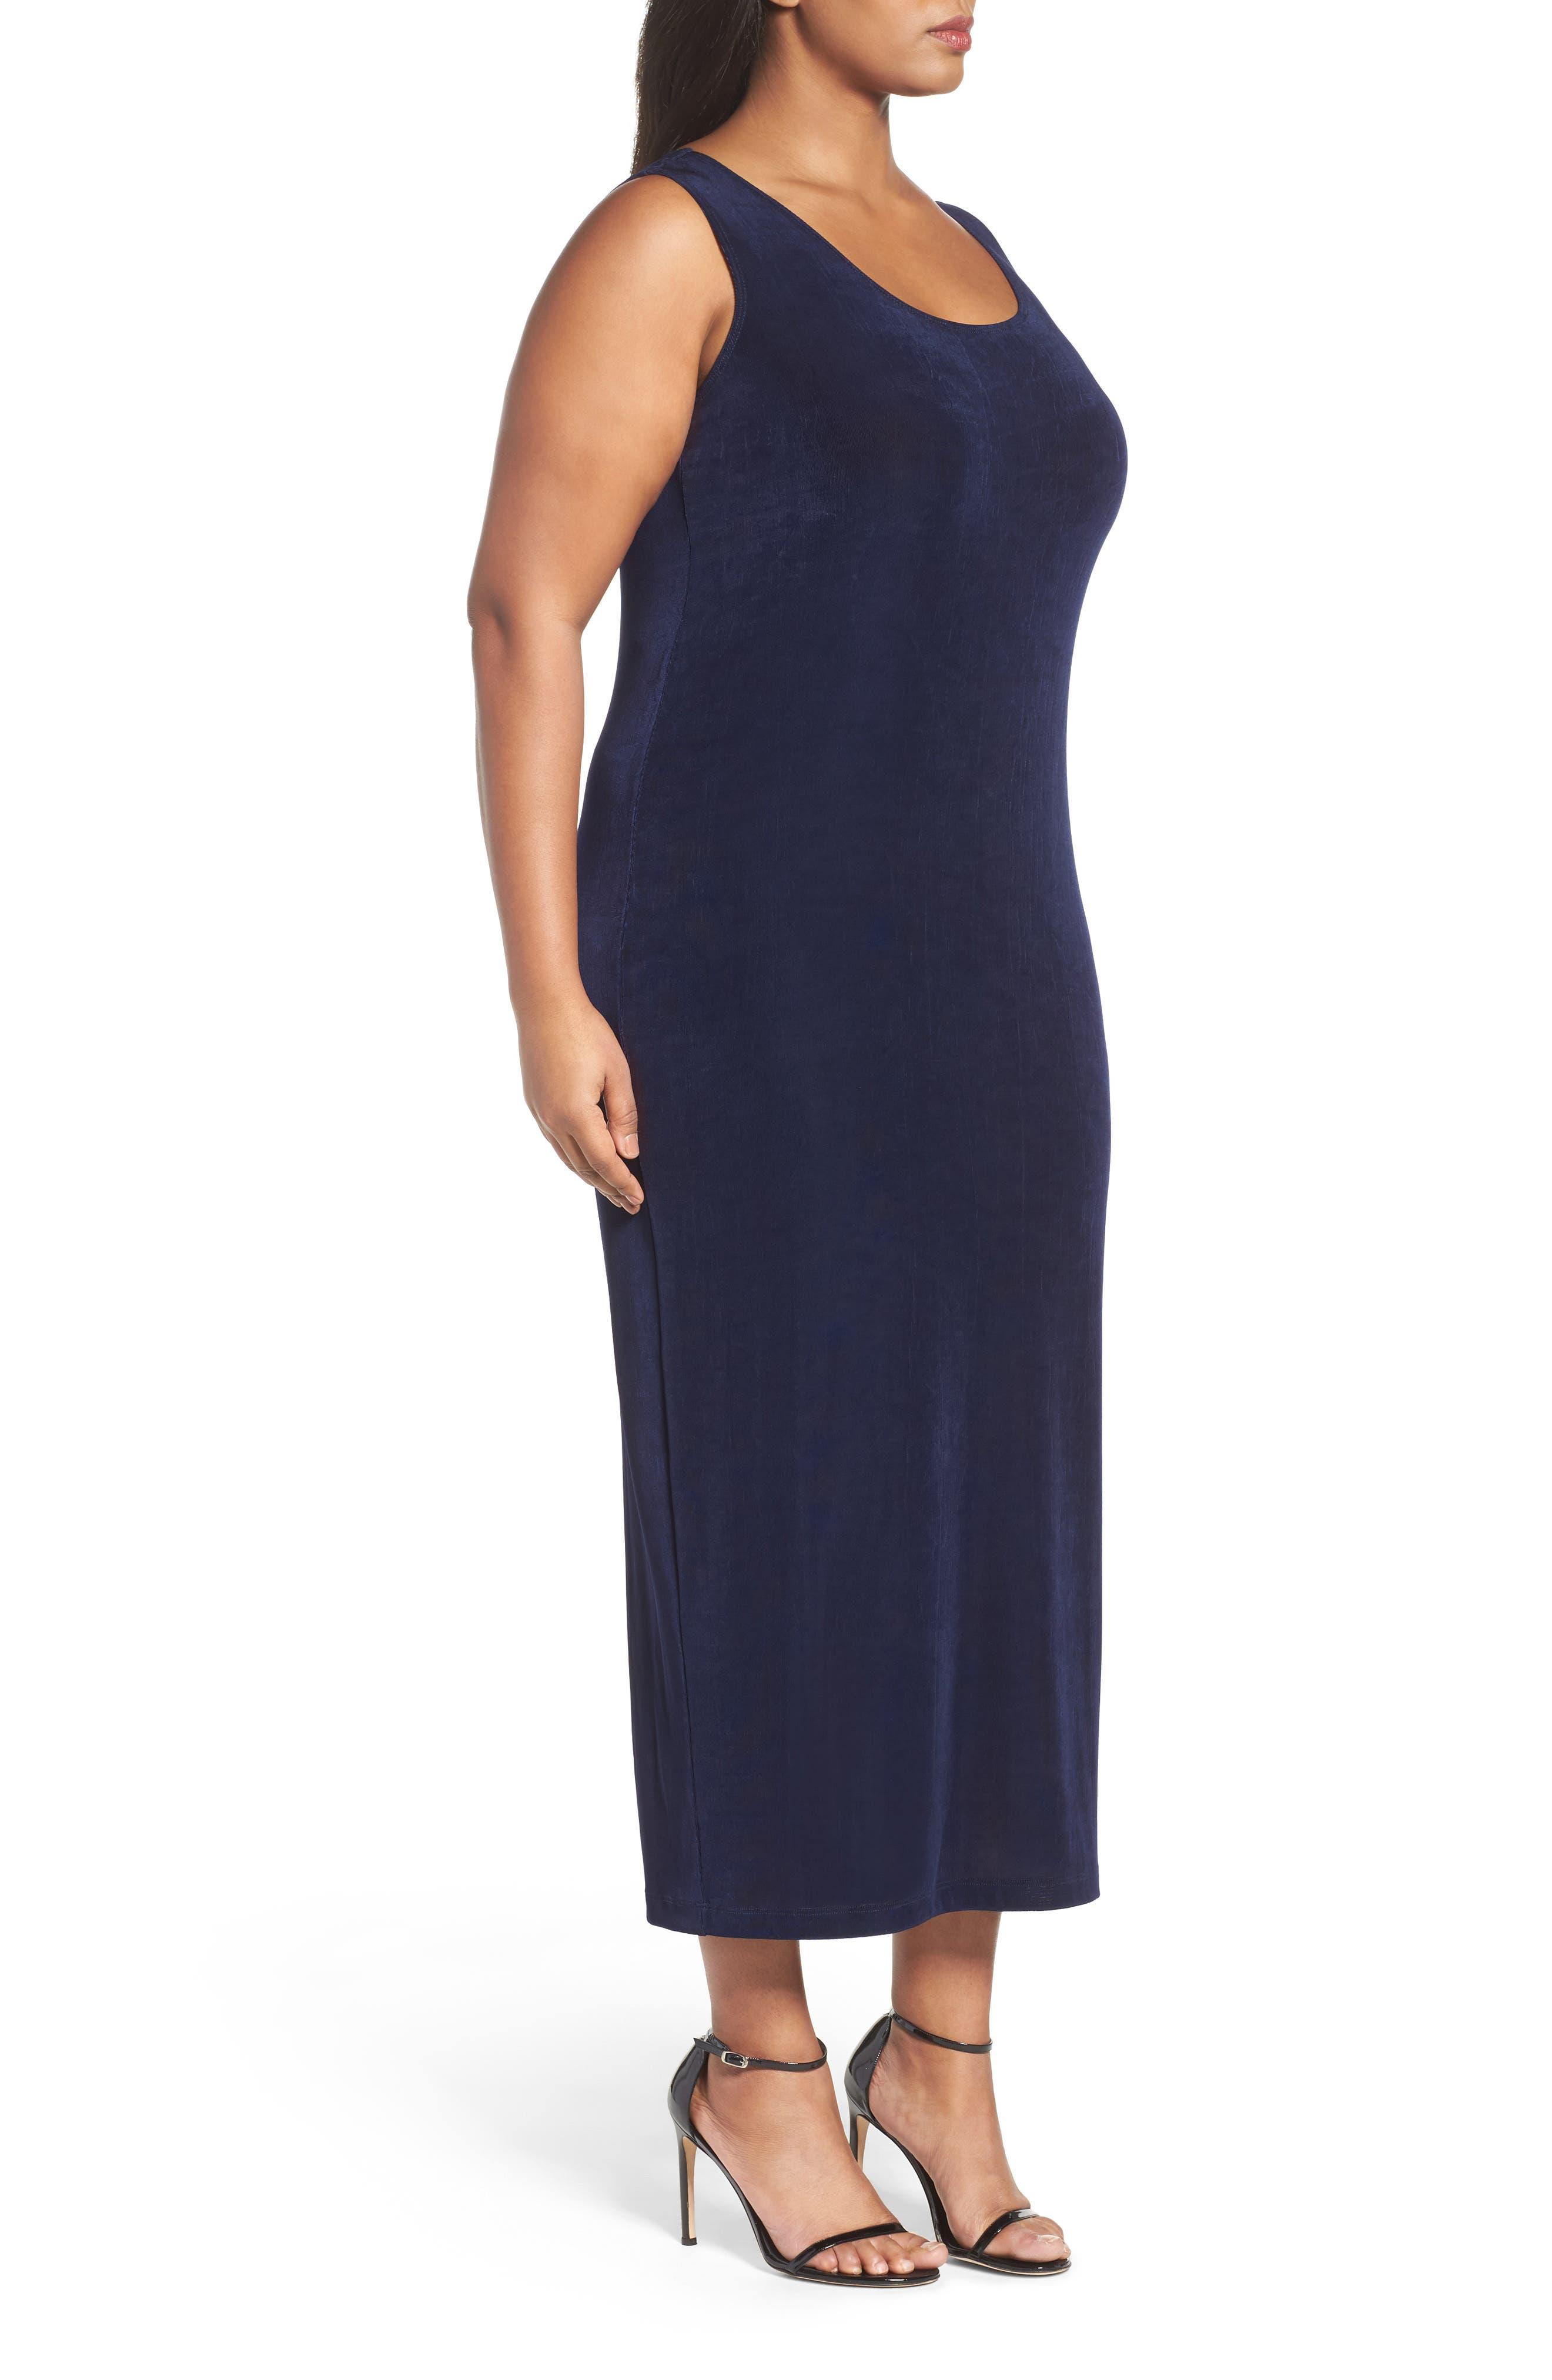 VIKKI VI,                             Sleeveless Maxi Tank Dress,                             Alternate thumbnail 3, color,                             NAVY